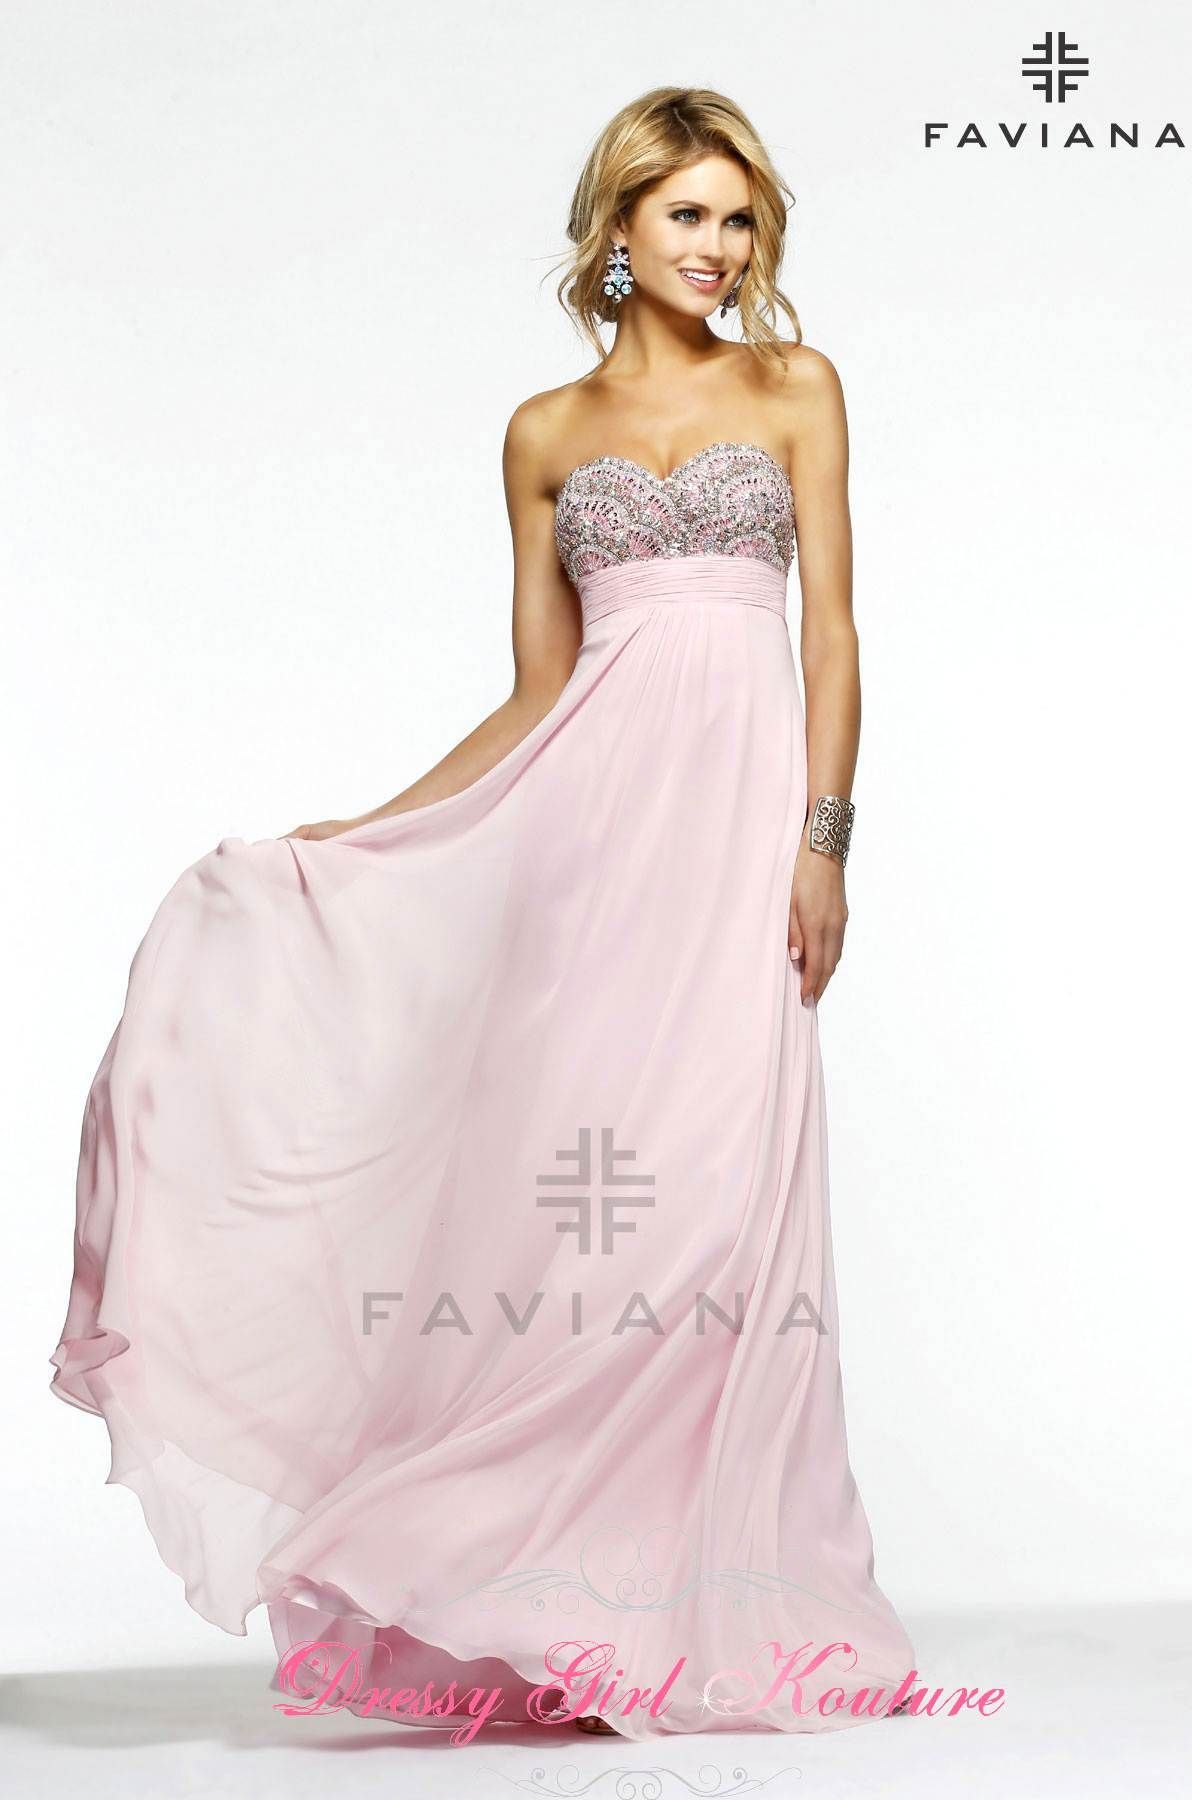 Faviana style S7385 Nice looking #FlowyChiffonDress #PromDress2014 #HomecomingDresses $478